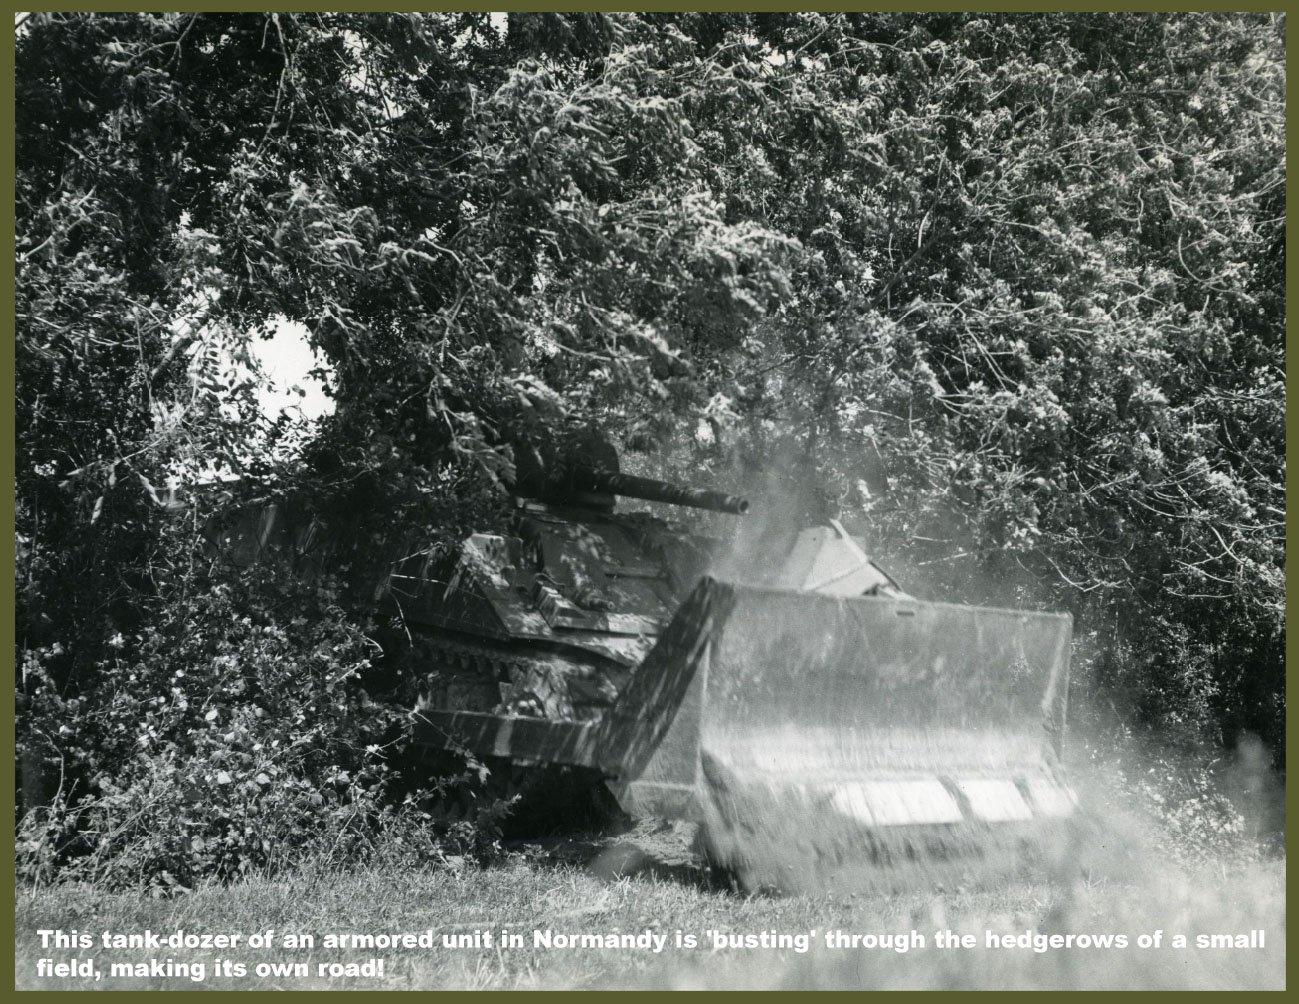 hedgerow tank dozer